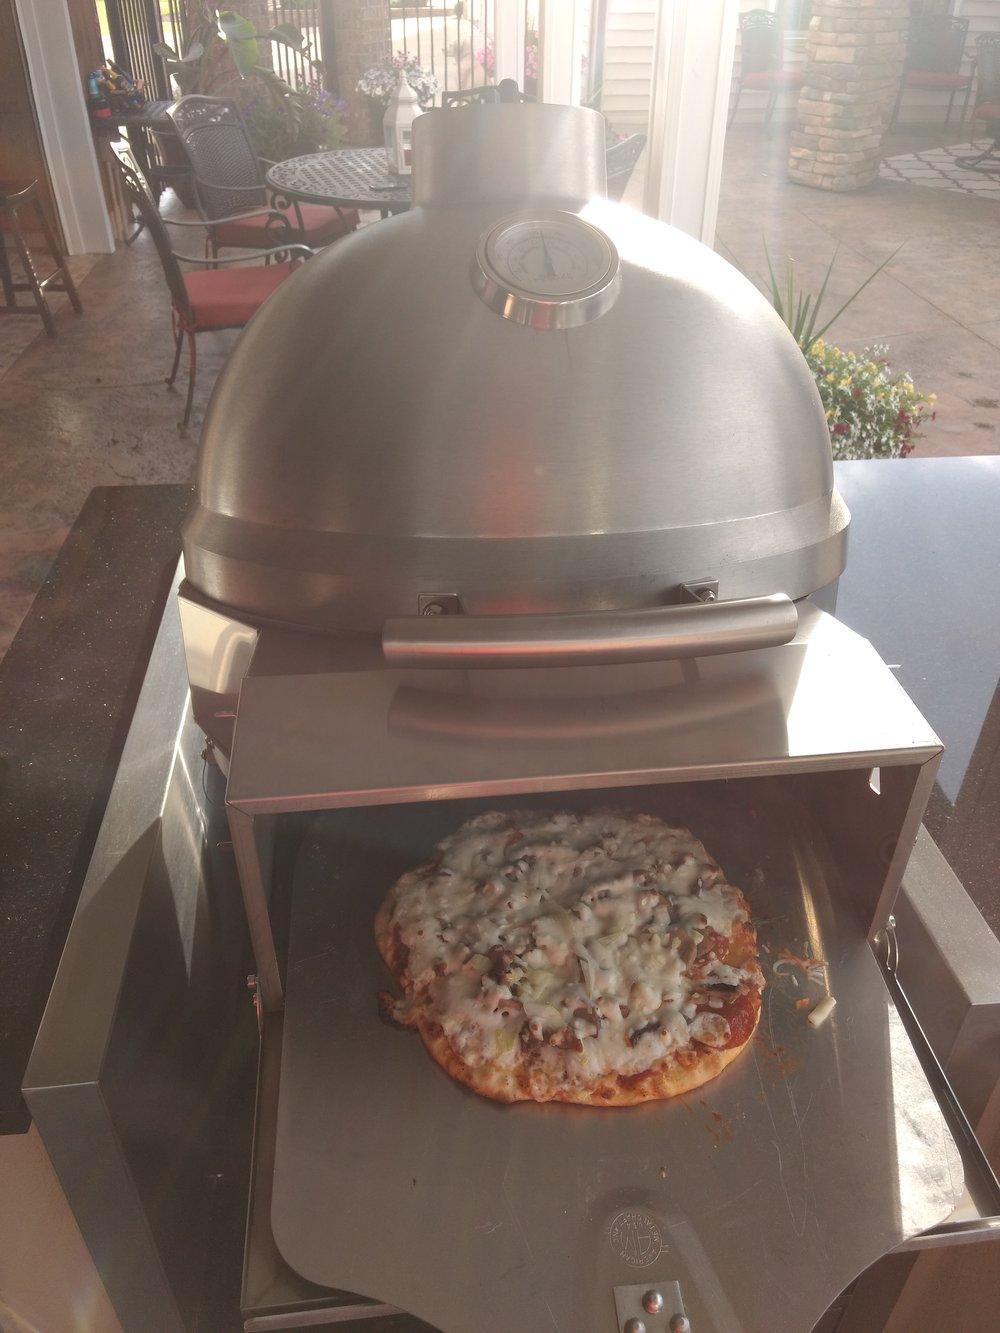 Pulling pizza in a Blaze